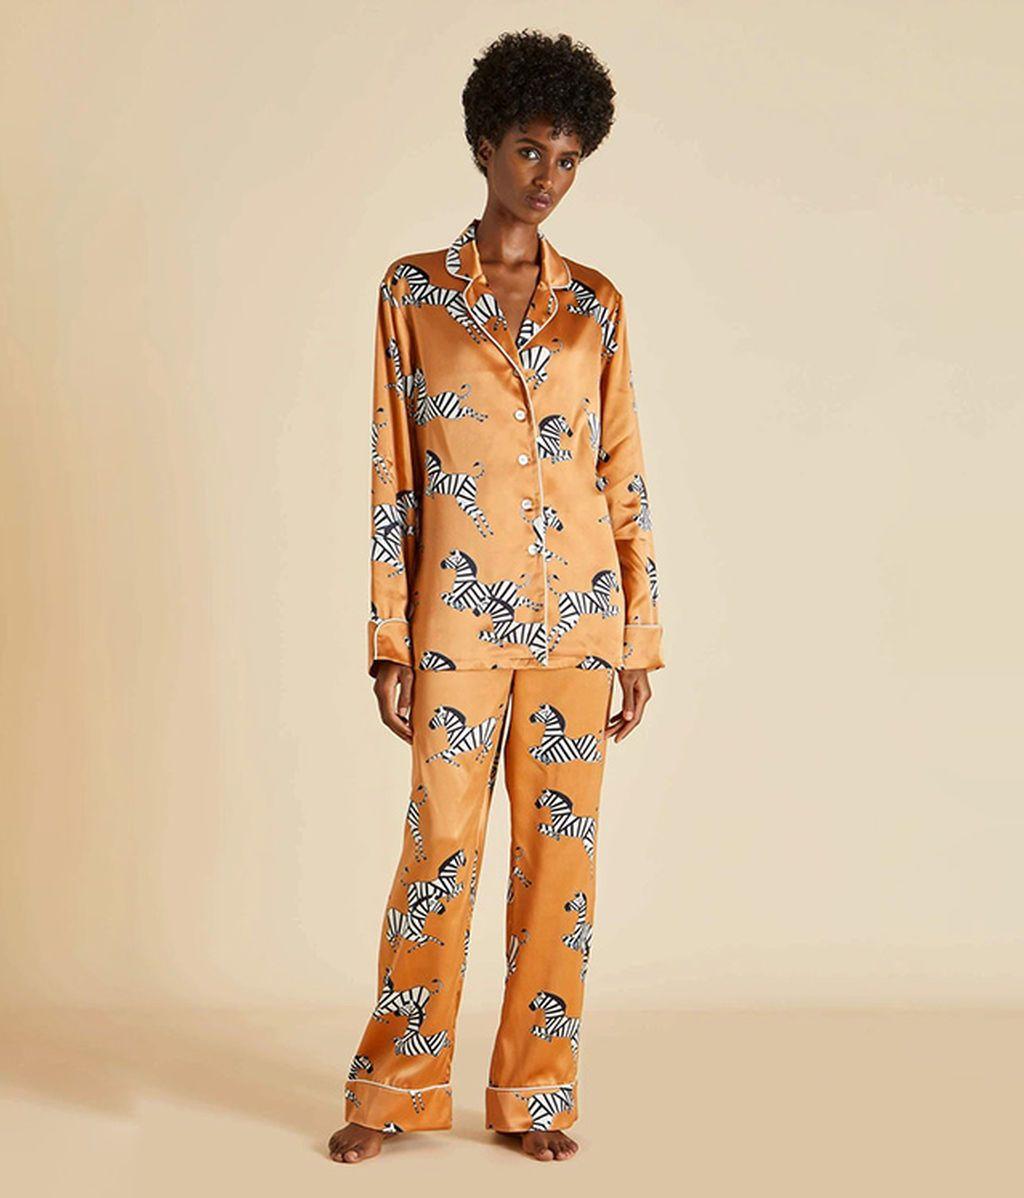 Pijama de seda de Oolivia von Halle